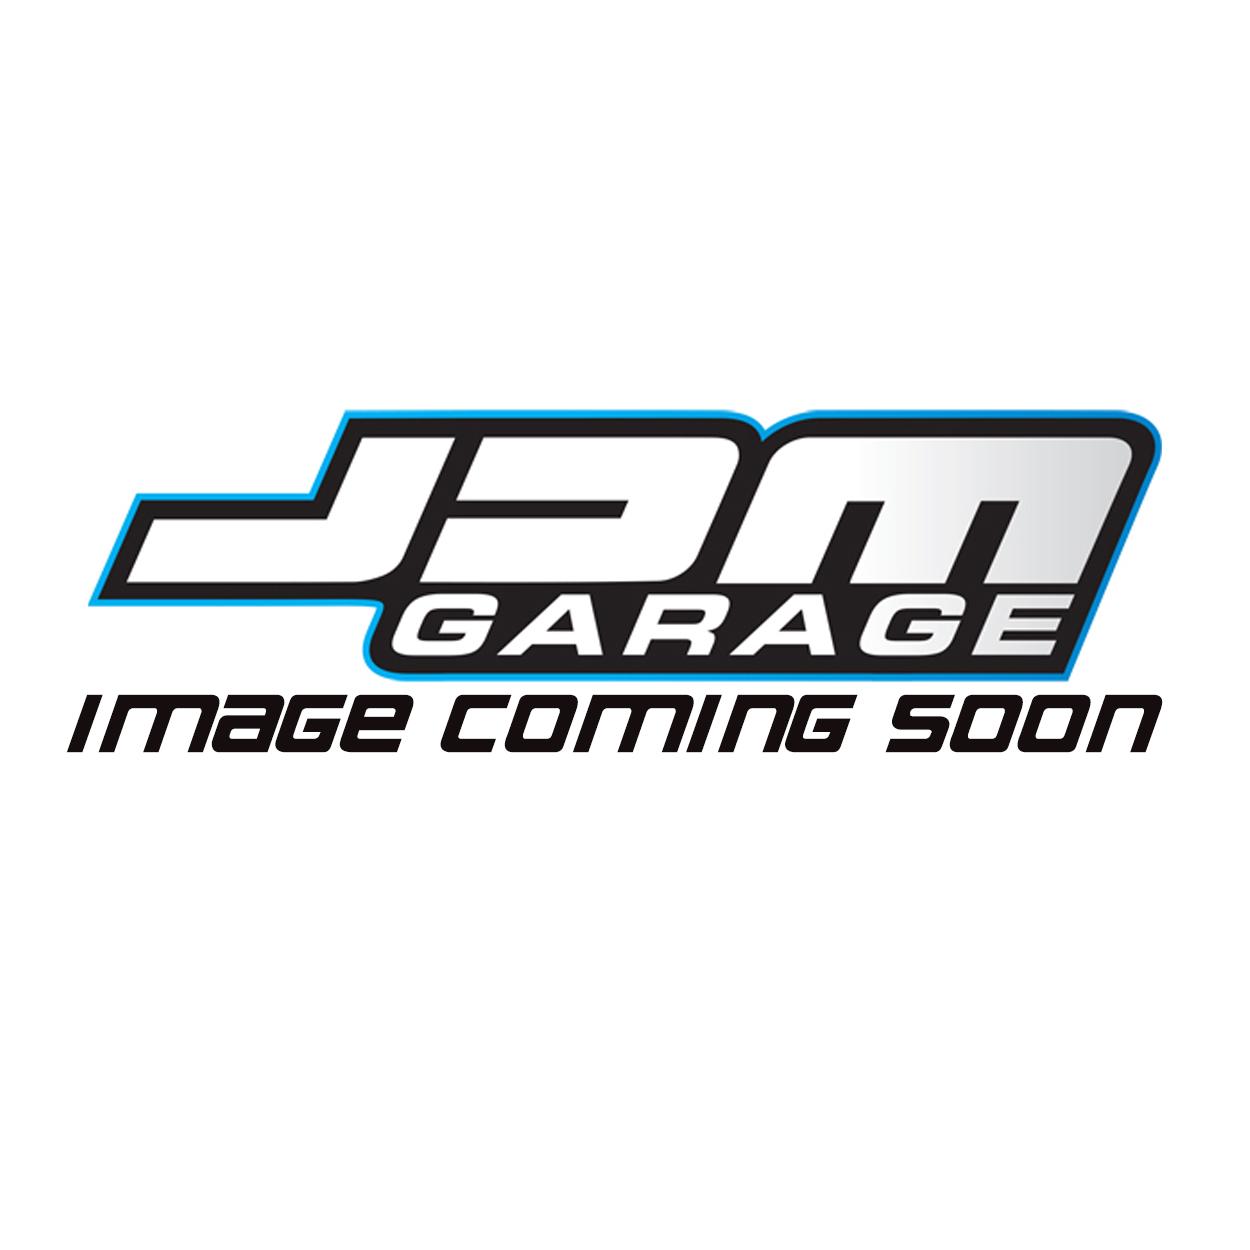 OE Replacement & EBC GD Series Front Brake Discs - Nissan 350Z Z33